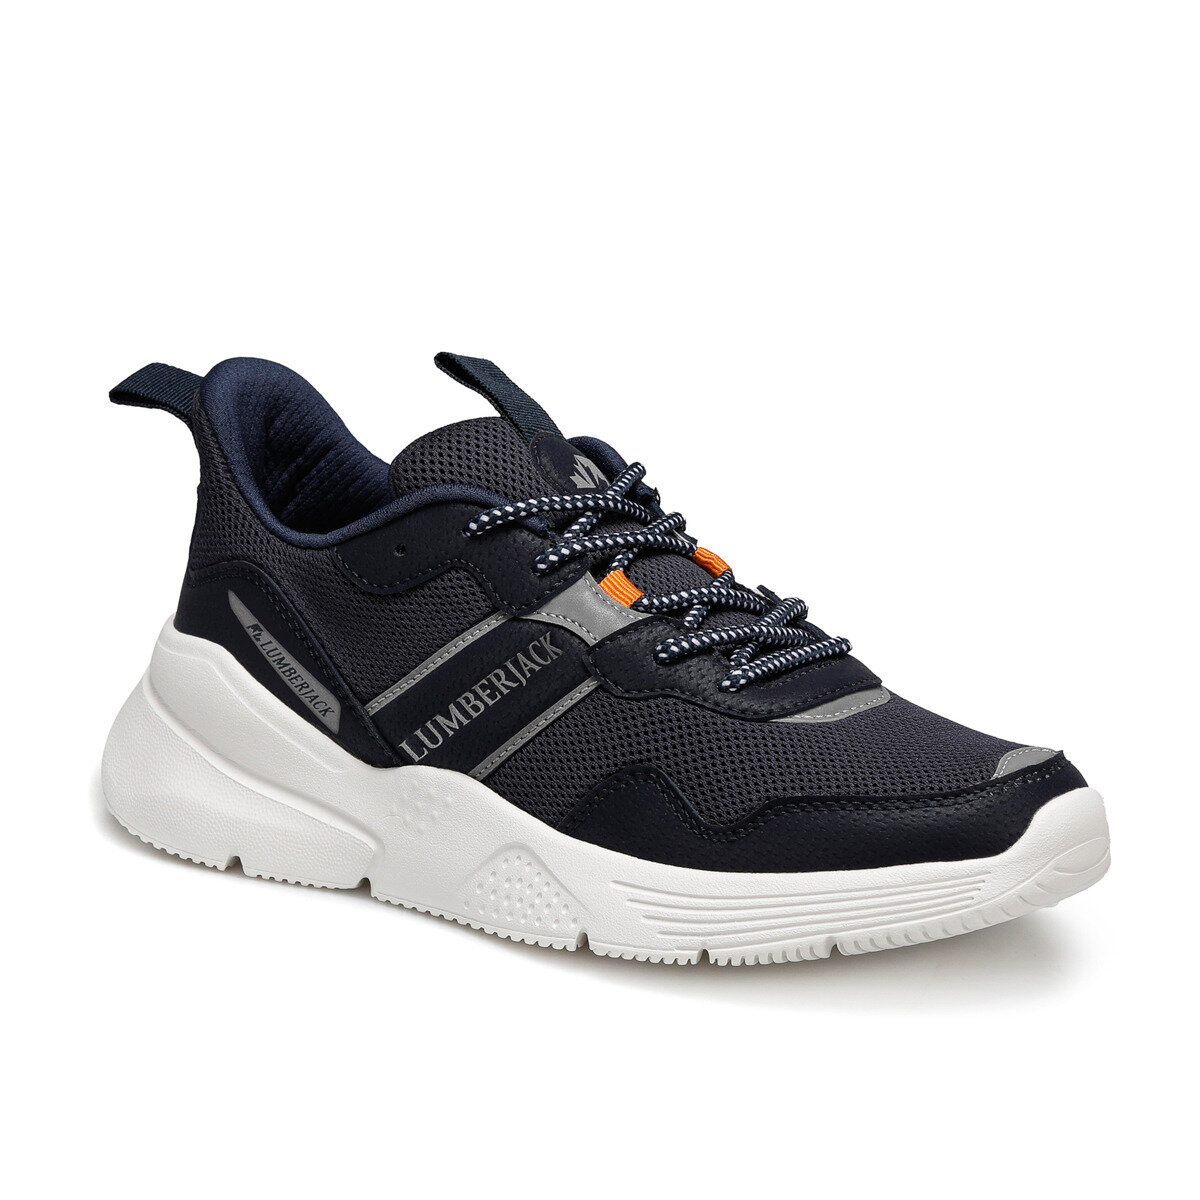 FLO Navy Blue Men's Sneaker Shoes Men Sneakers Lightweight Breathable Zapatillas Man Casual Shoes Footwear Zapatos Hombre LUMBERJACK BELGRADE